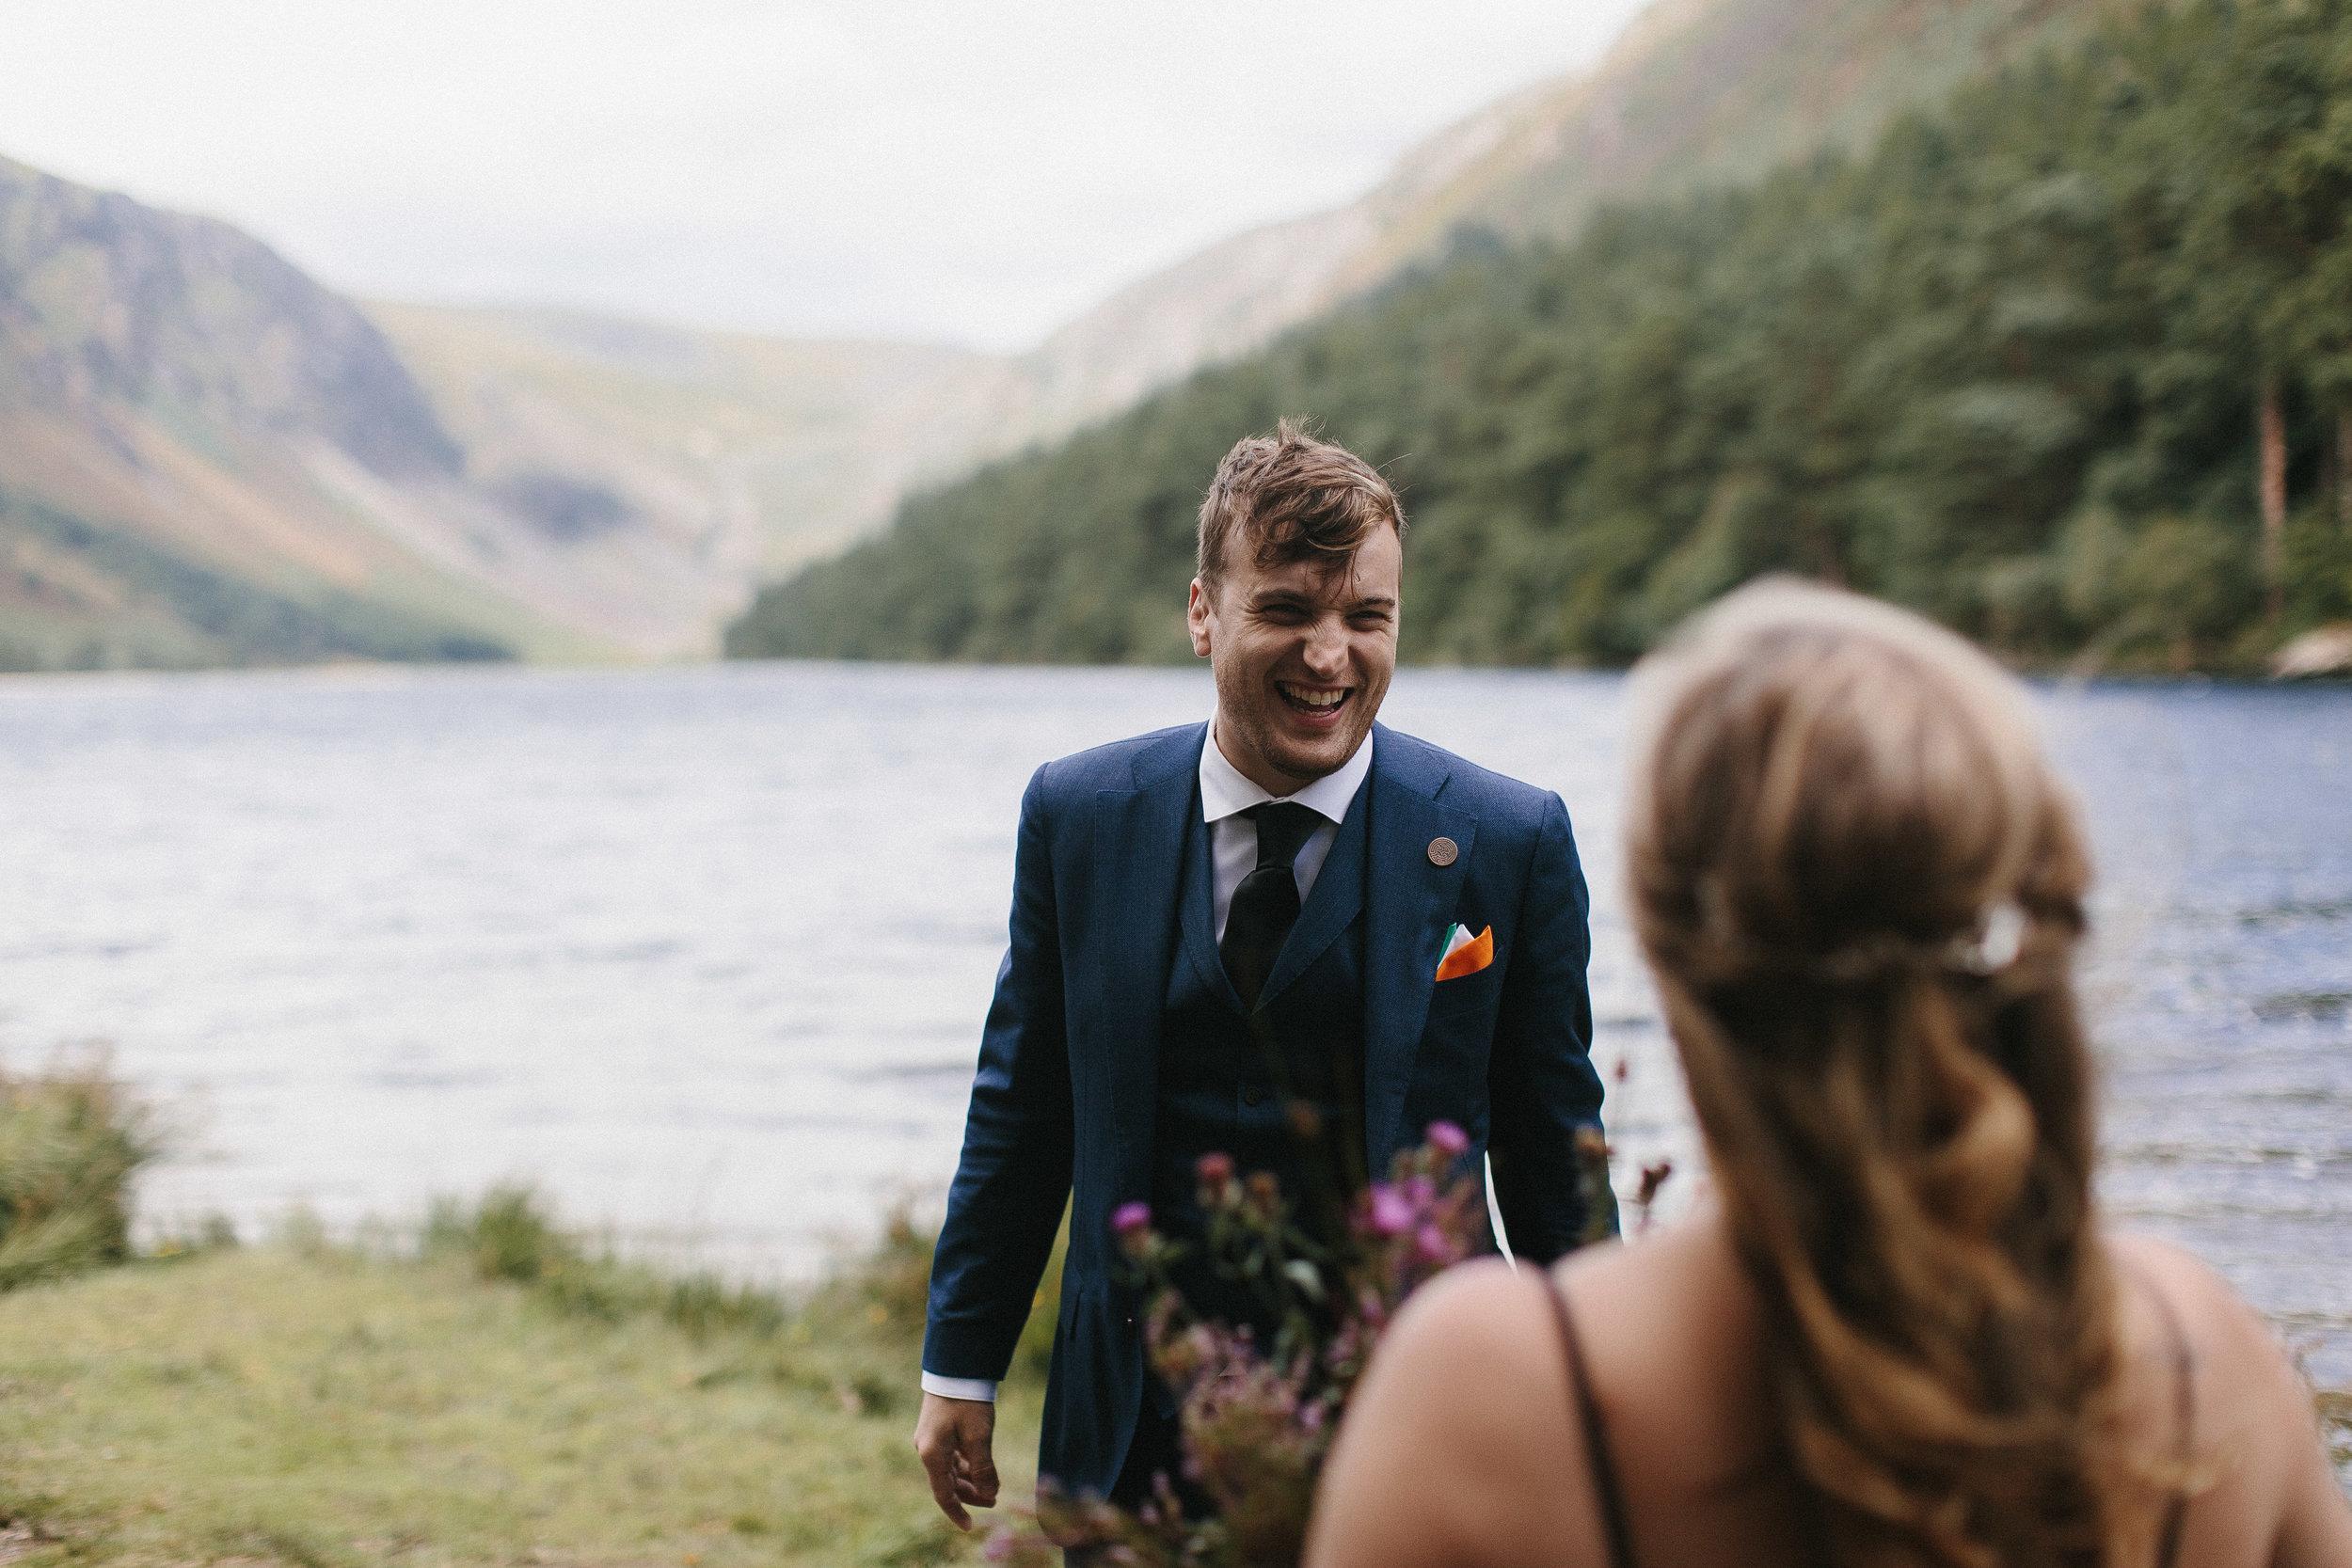 ireland_elopement_black_wedding_dress_wicklow_glendalough_athy_st_kevins_way_1459.jpg